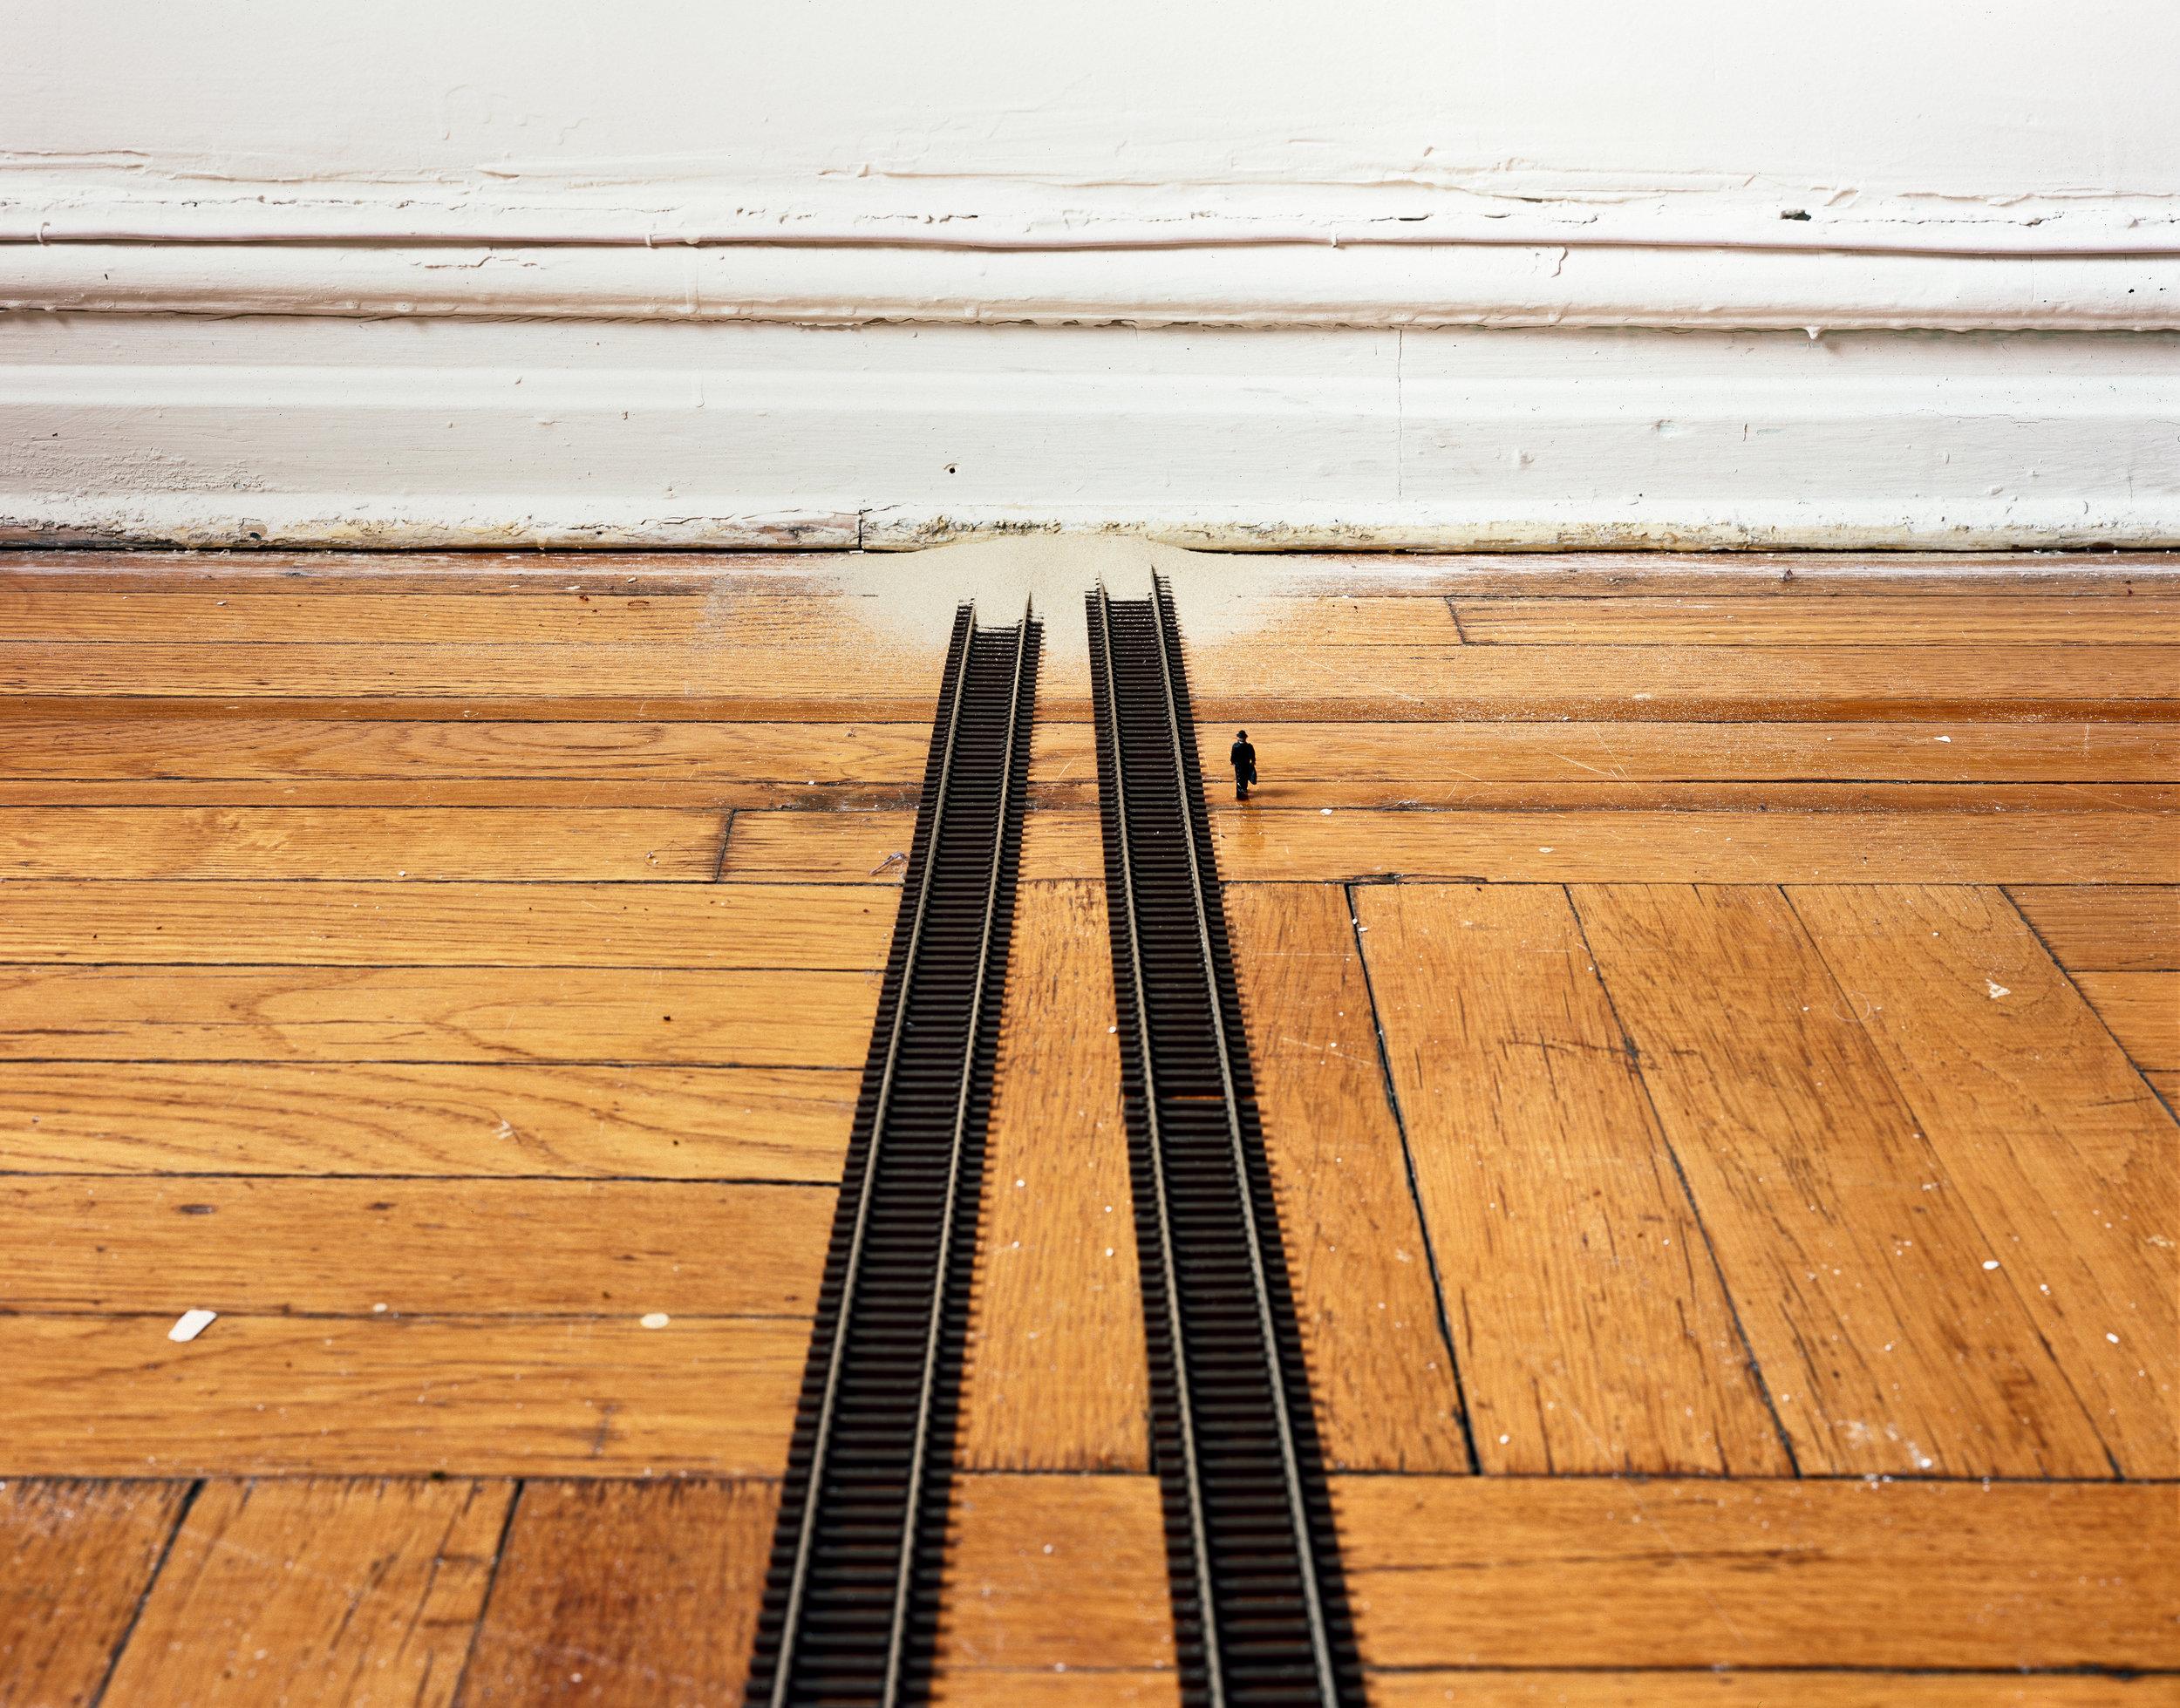 """Rail Tracks (miniature)"" , 2013 Archival pigment print, 16""x20""  Courtesy Yoav Friedlander & Carrie Able Gallery"